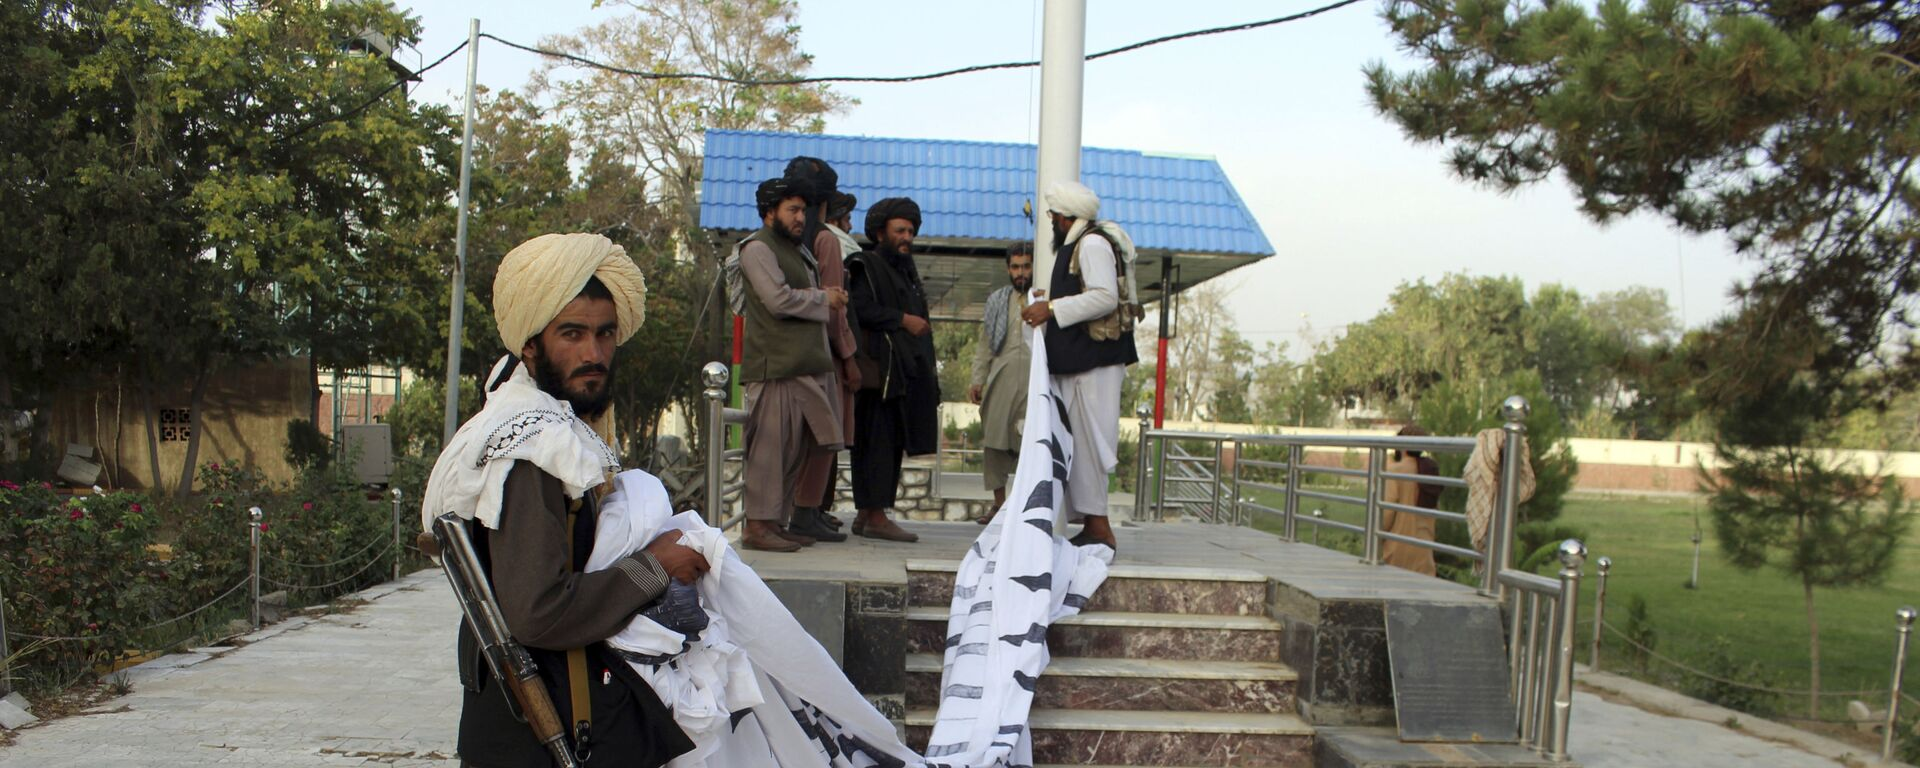 Боевики Талибан* поднимают свой флаг в городе Газни  - Sputnik Таджикистан, 1920, 08.09.2021